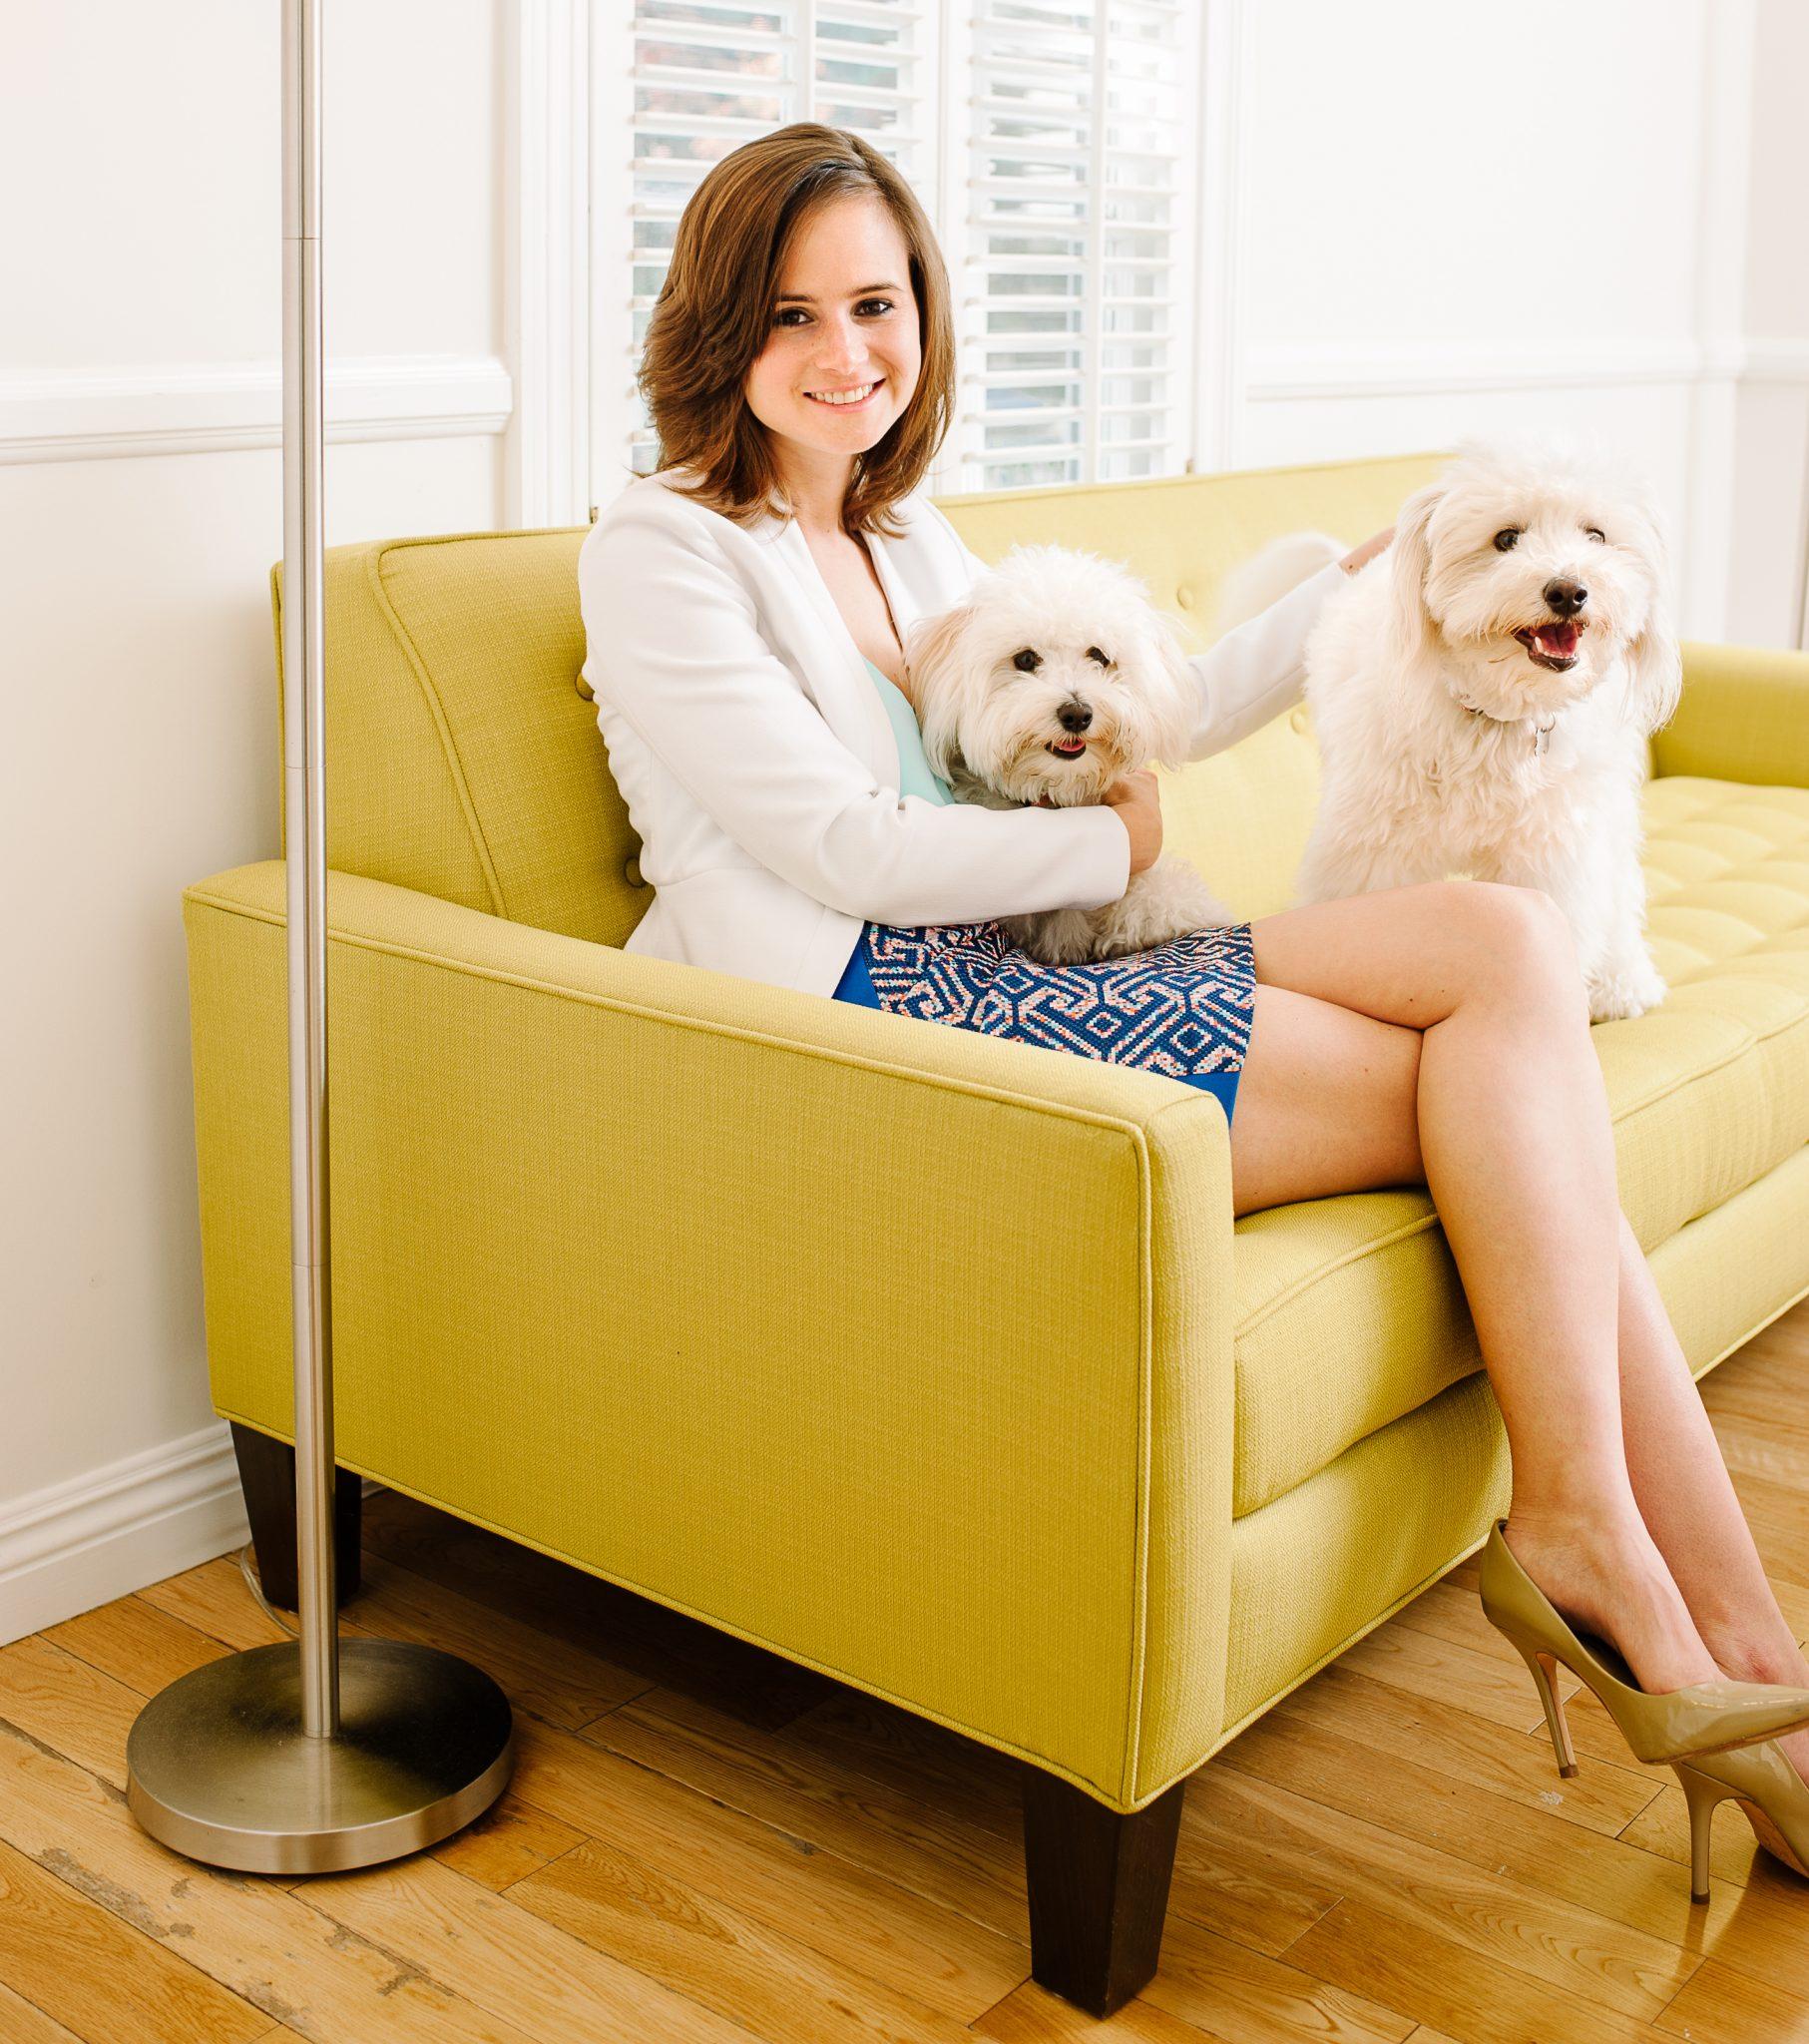 Profile: Jessica Carbino, Tinder Sociologist